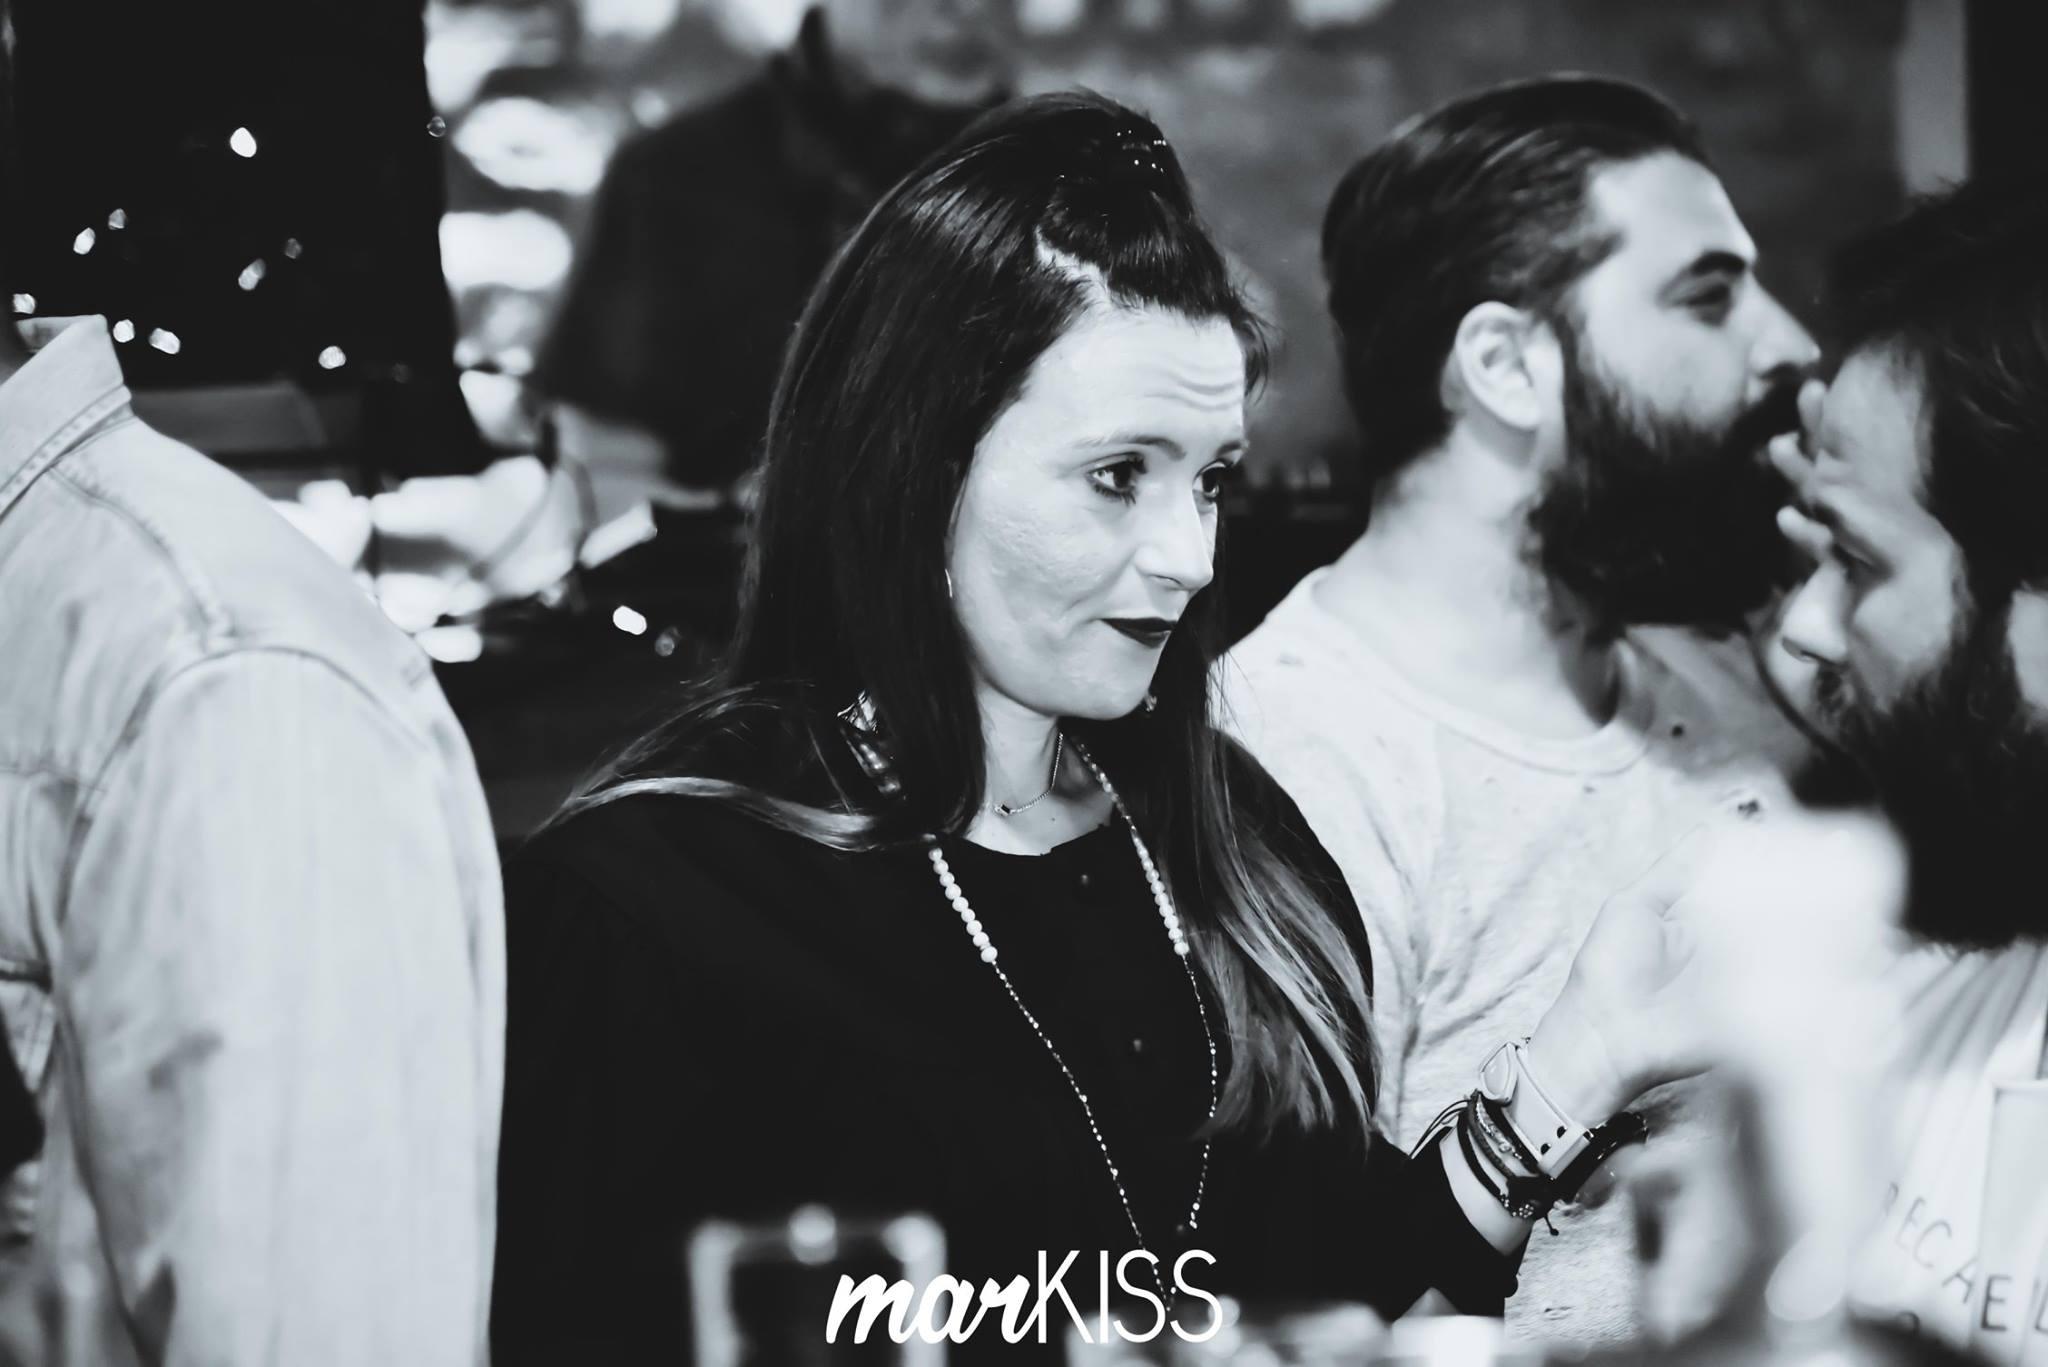 mar7 - Ότι καλύτερο είδαμε στο opening του marKISS! (Παρασκευή 20 Οκτωβρίου)